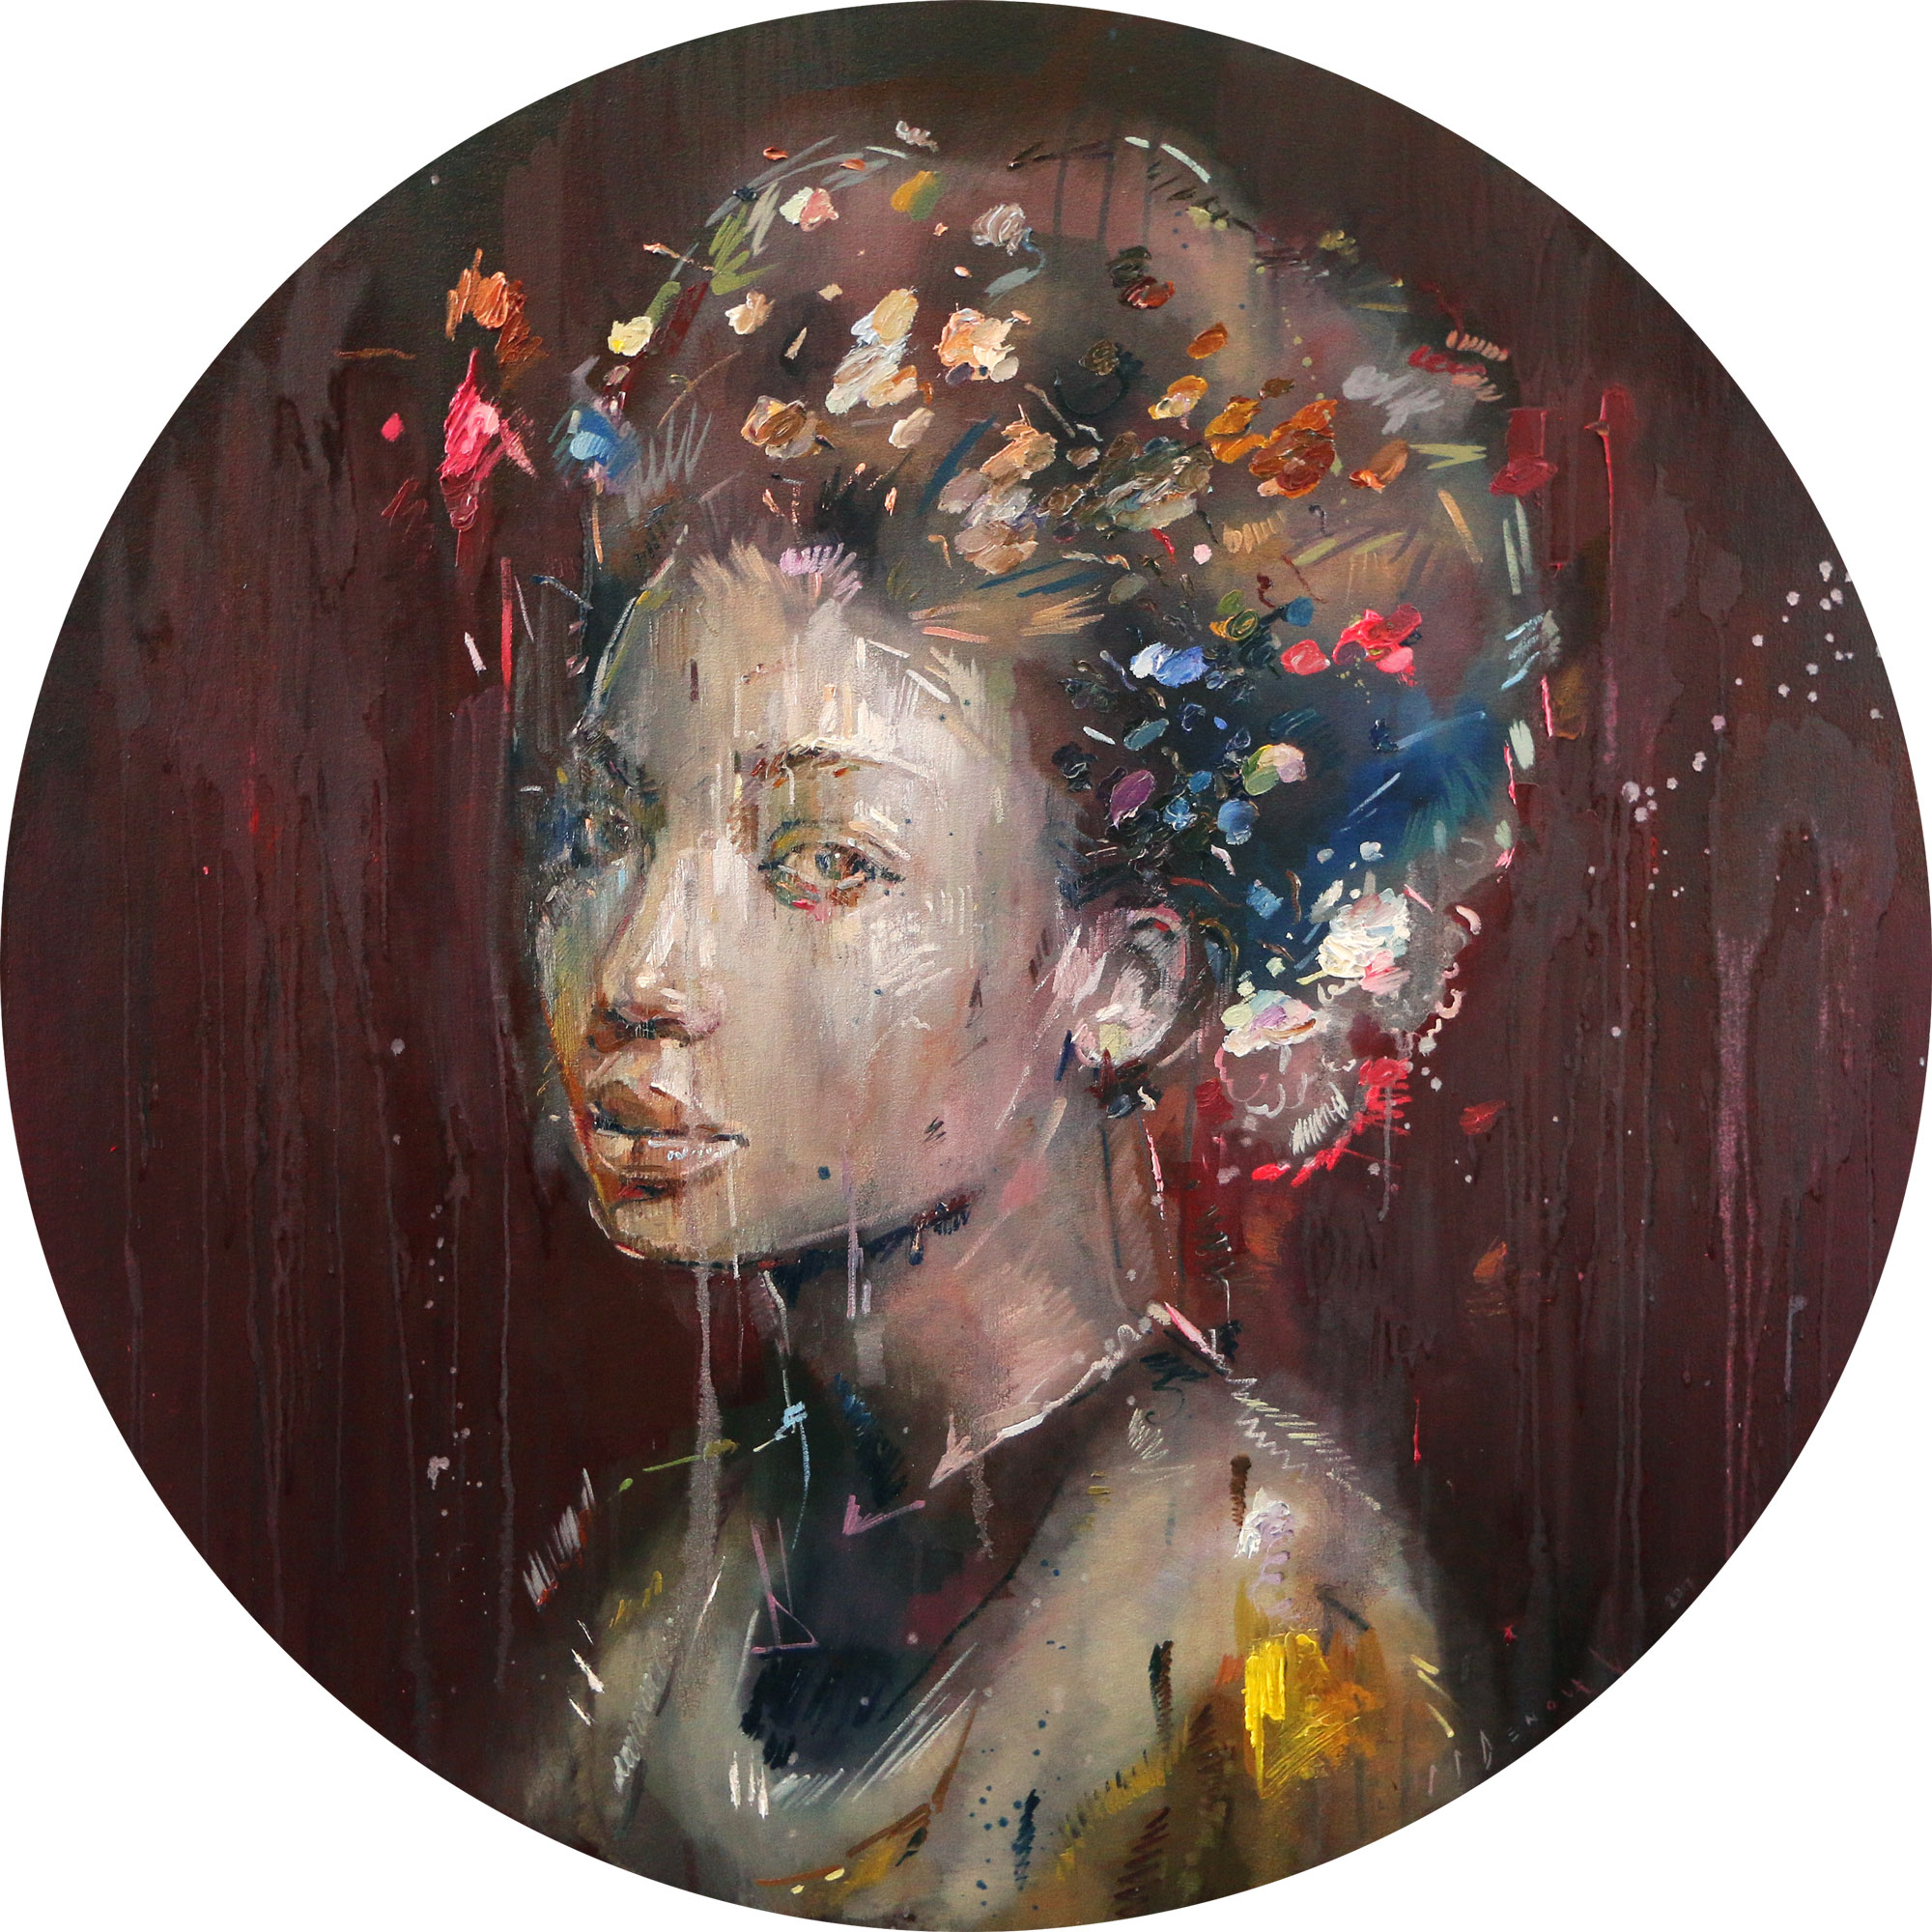 Ocular (Ellen-Sharma) . Oil on canvas. 110cm diameter.